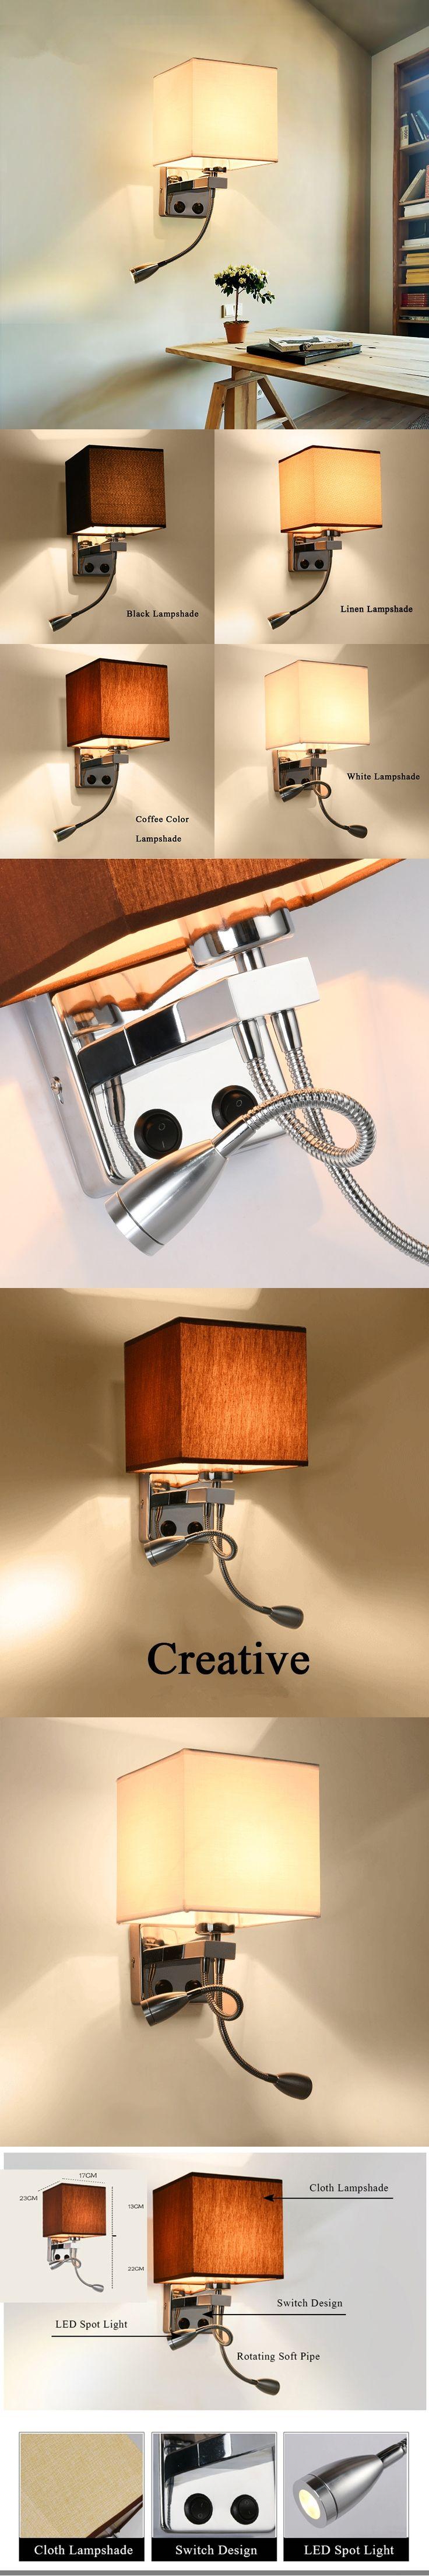 Modern Wall Lamp Fabric Lampshade Bedroom Bedside Wall Sconce Flexible Reading Light Fixture Aisle Wall Mount Lighting arandela